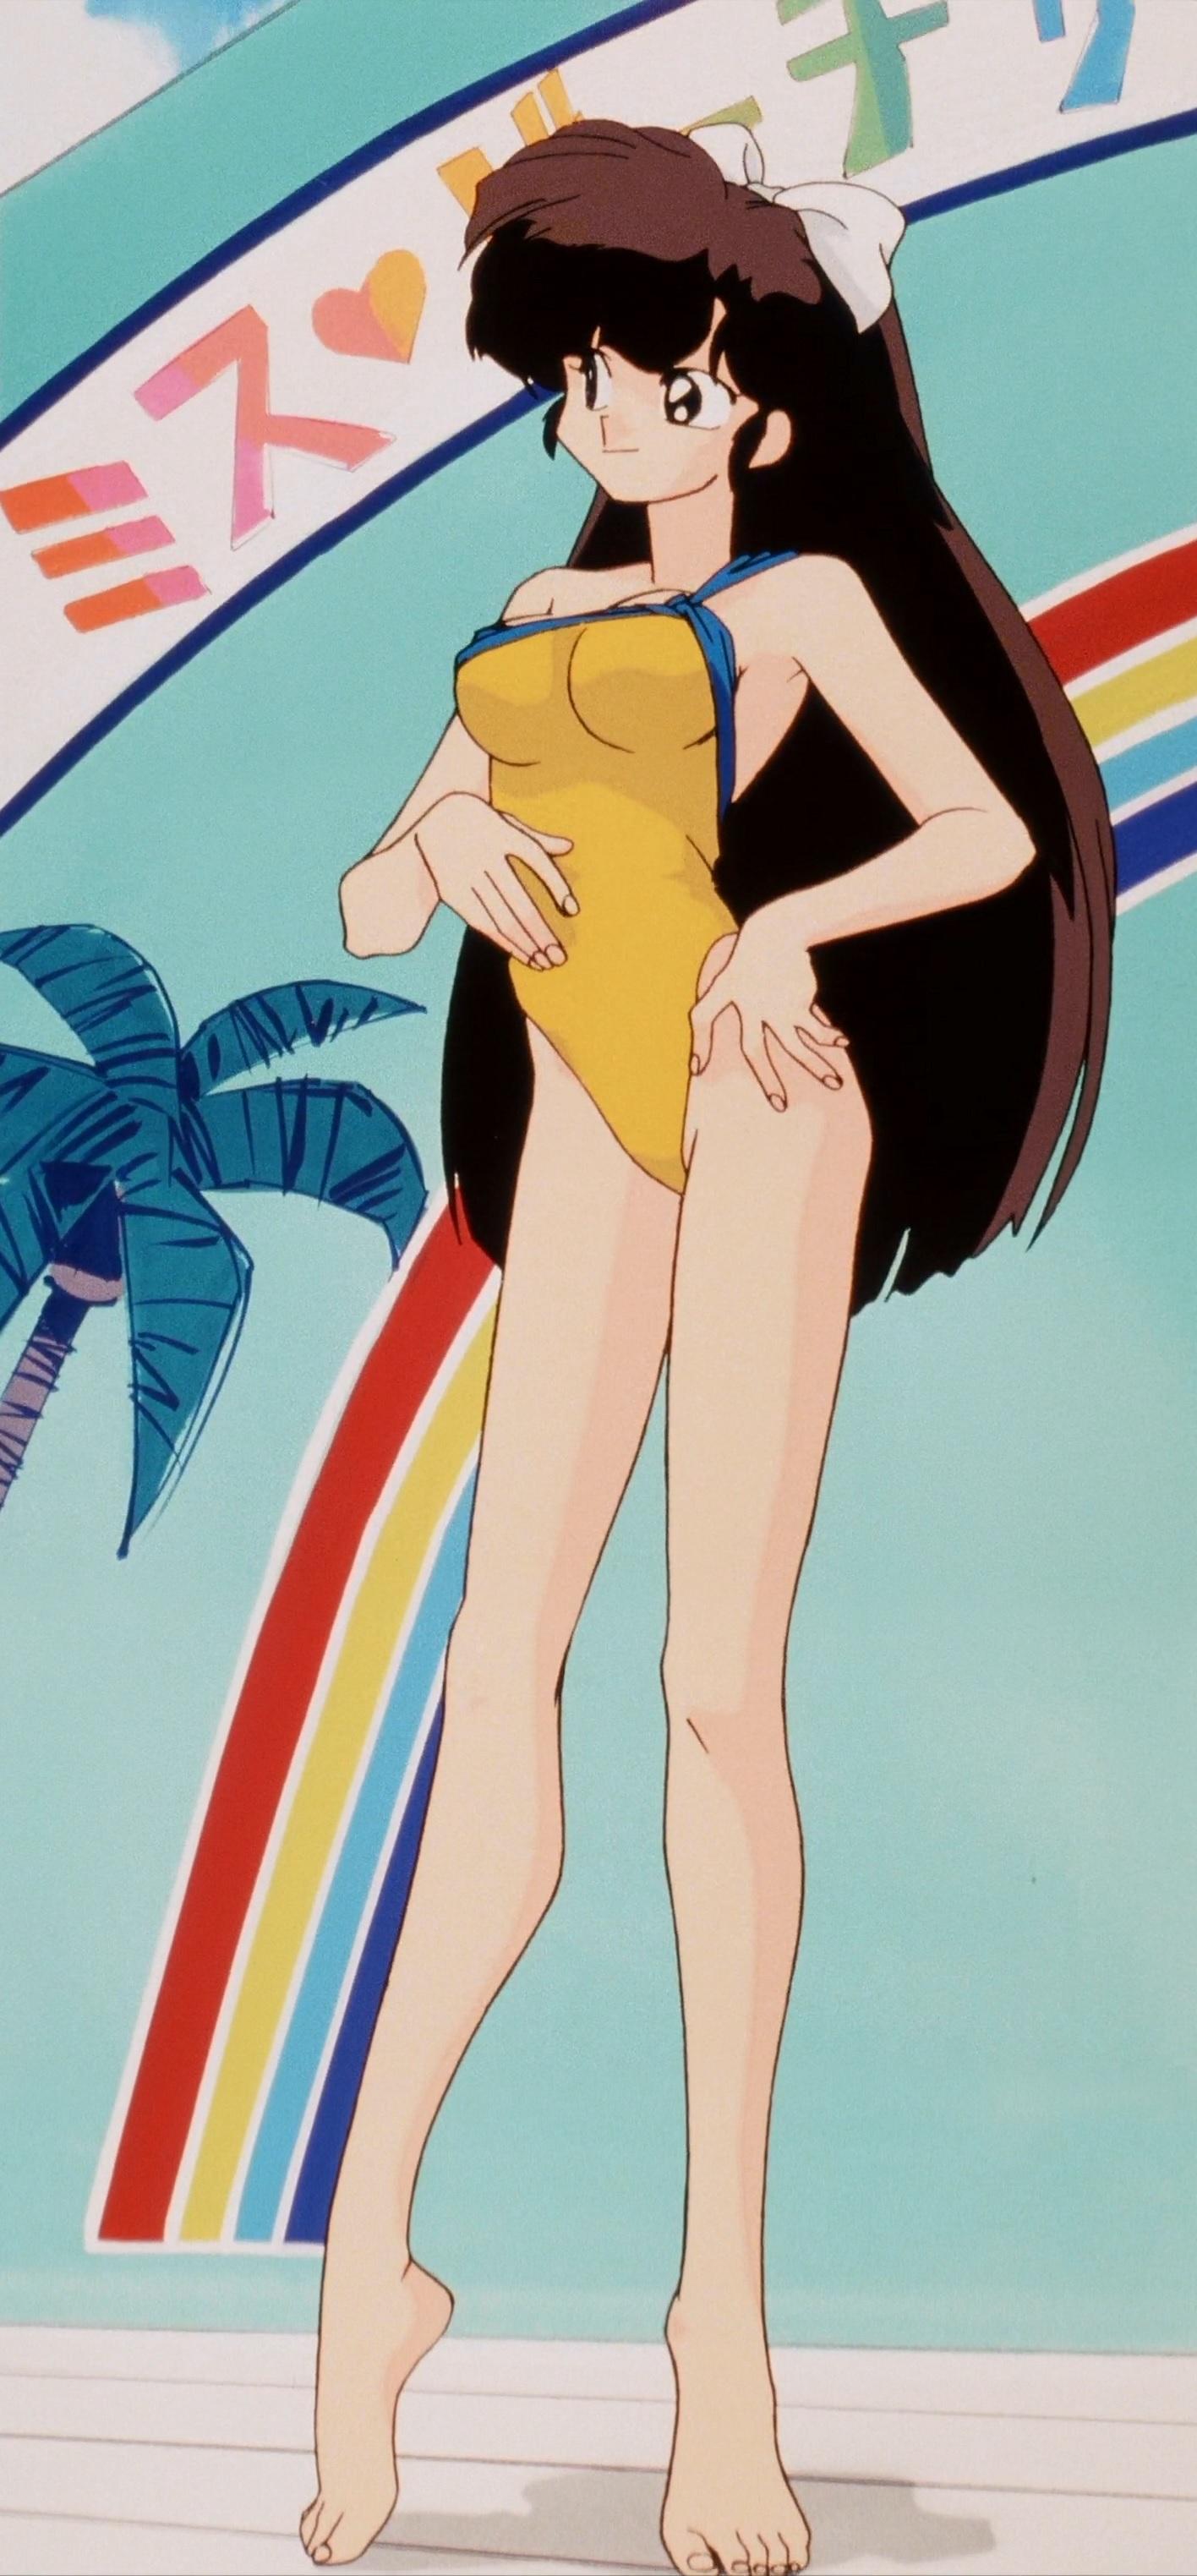 Agent aika anime ecchi scenes 1